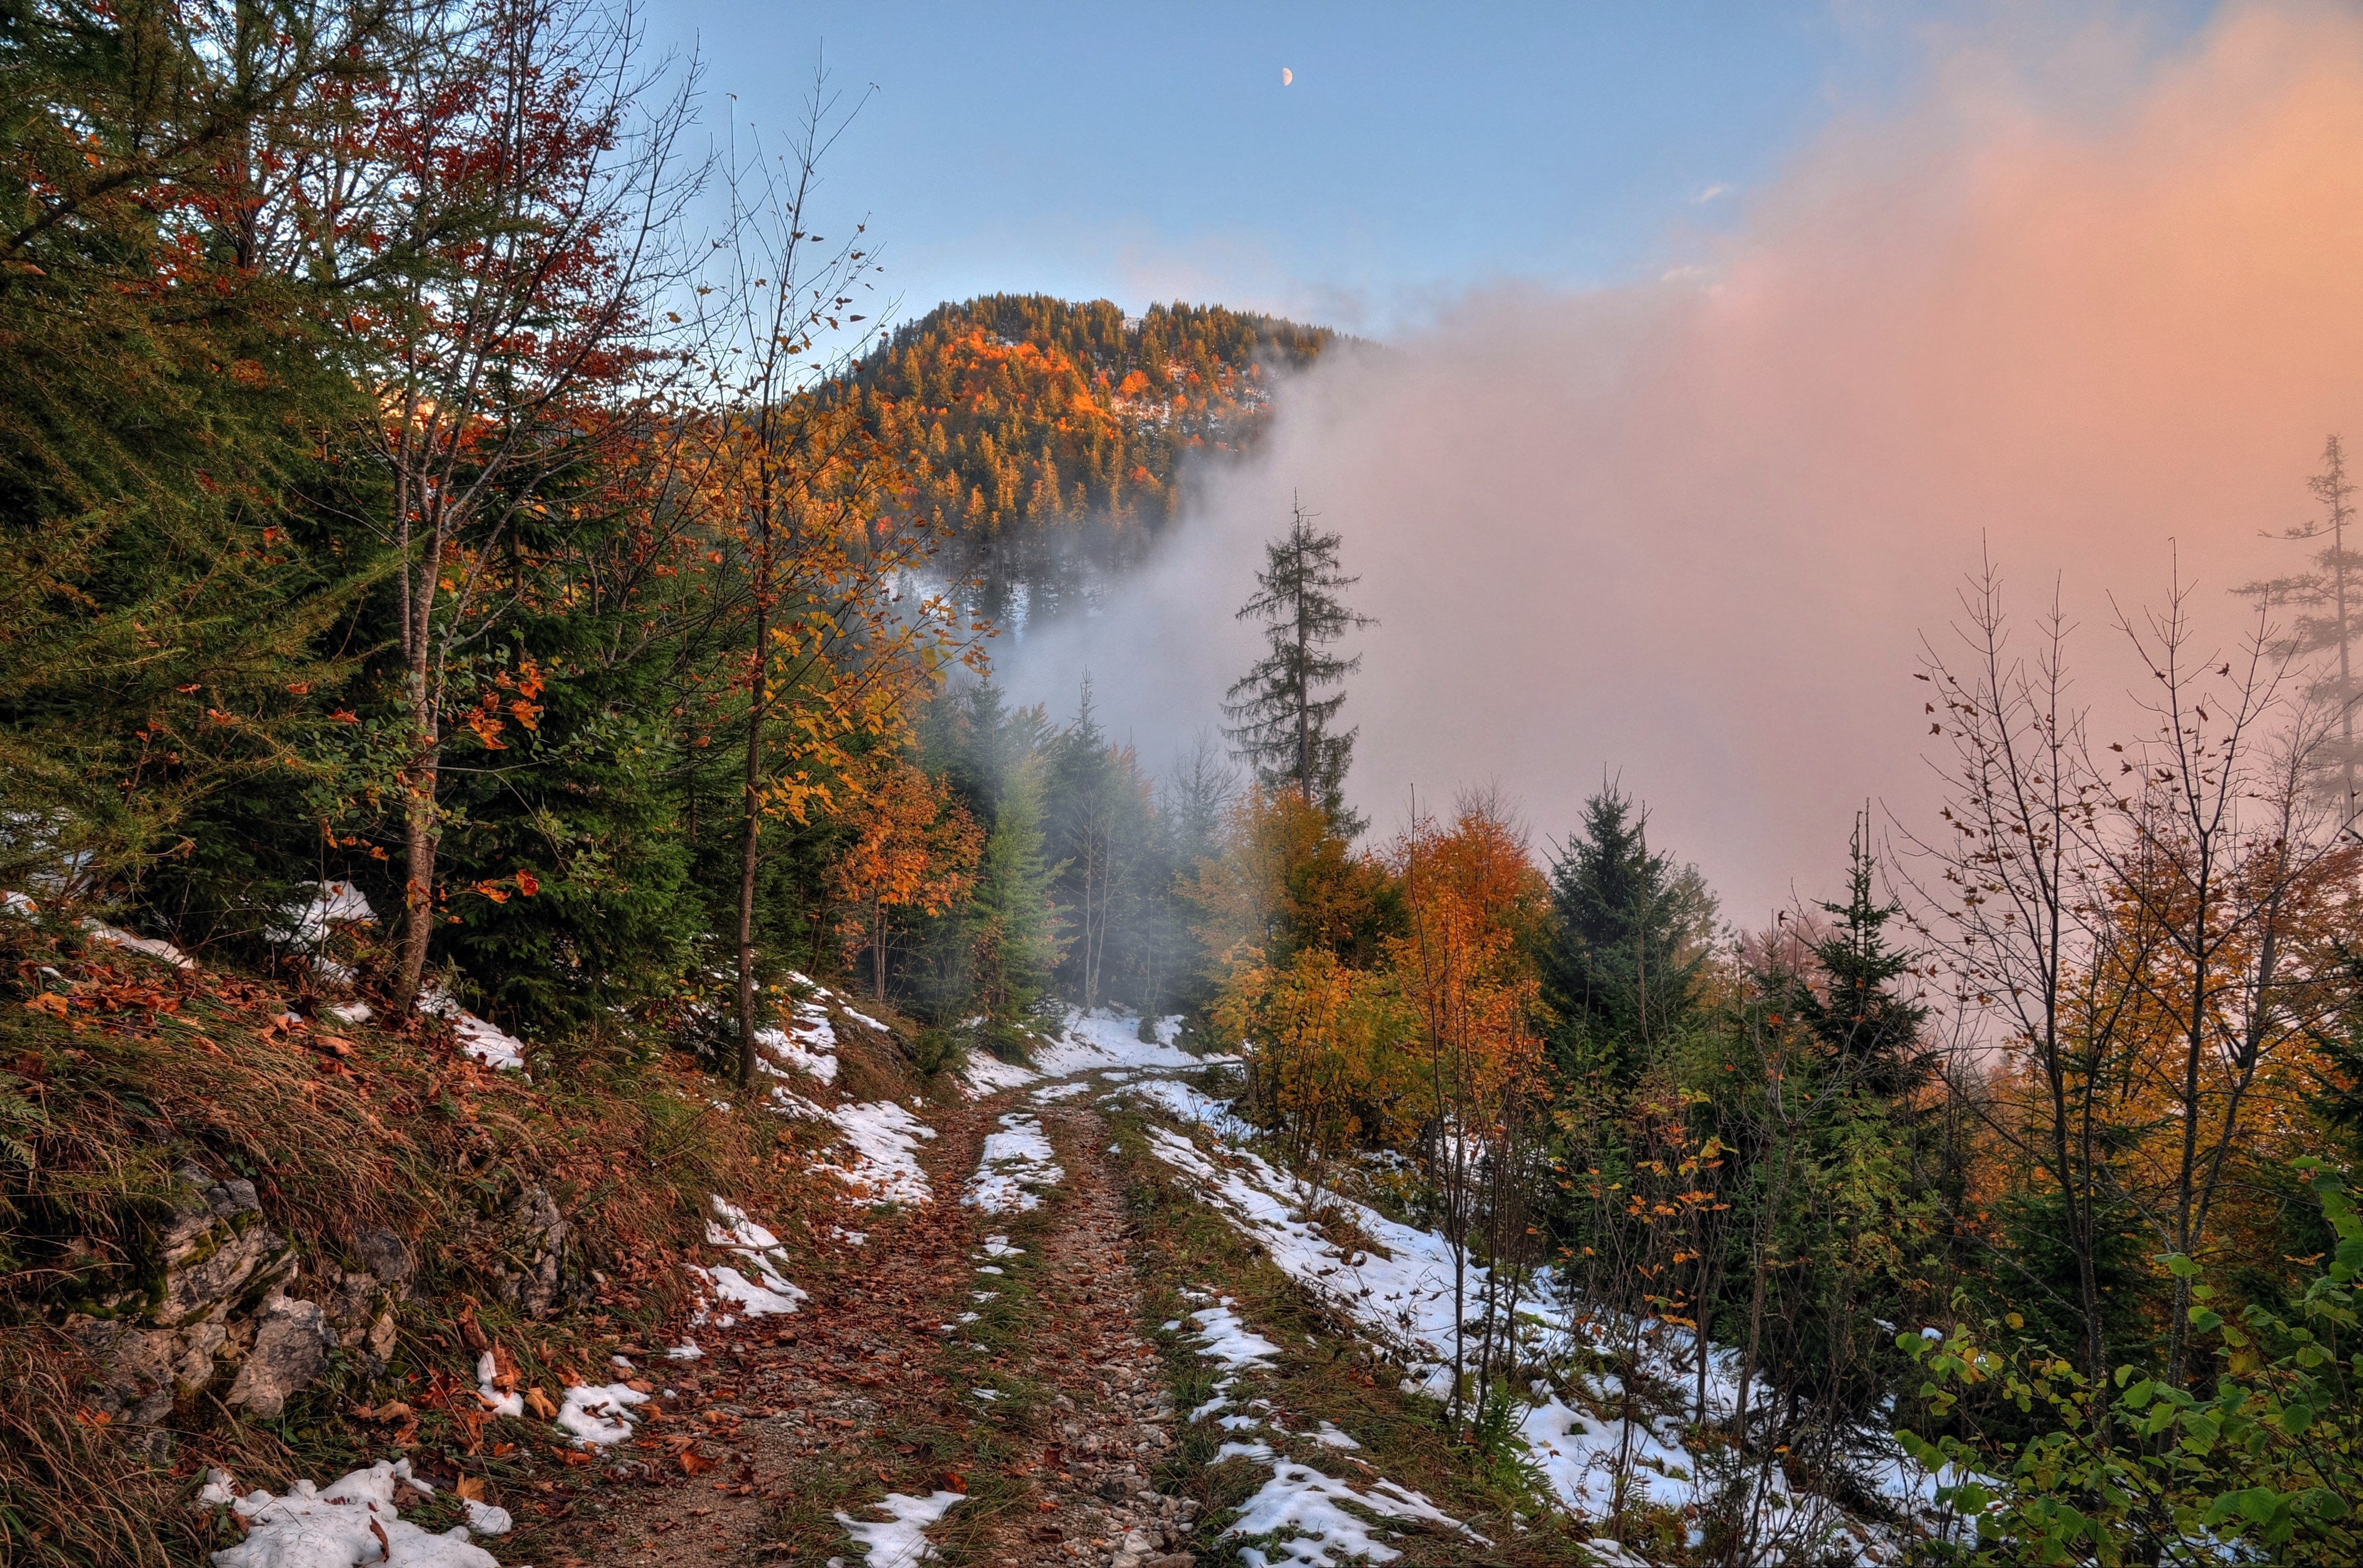 Autumn road trees landscape snow wallpaper 4278x2839 174846 4278x2839